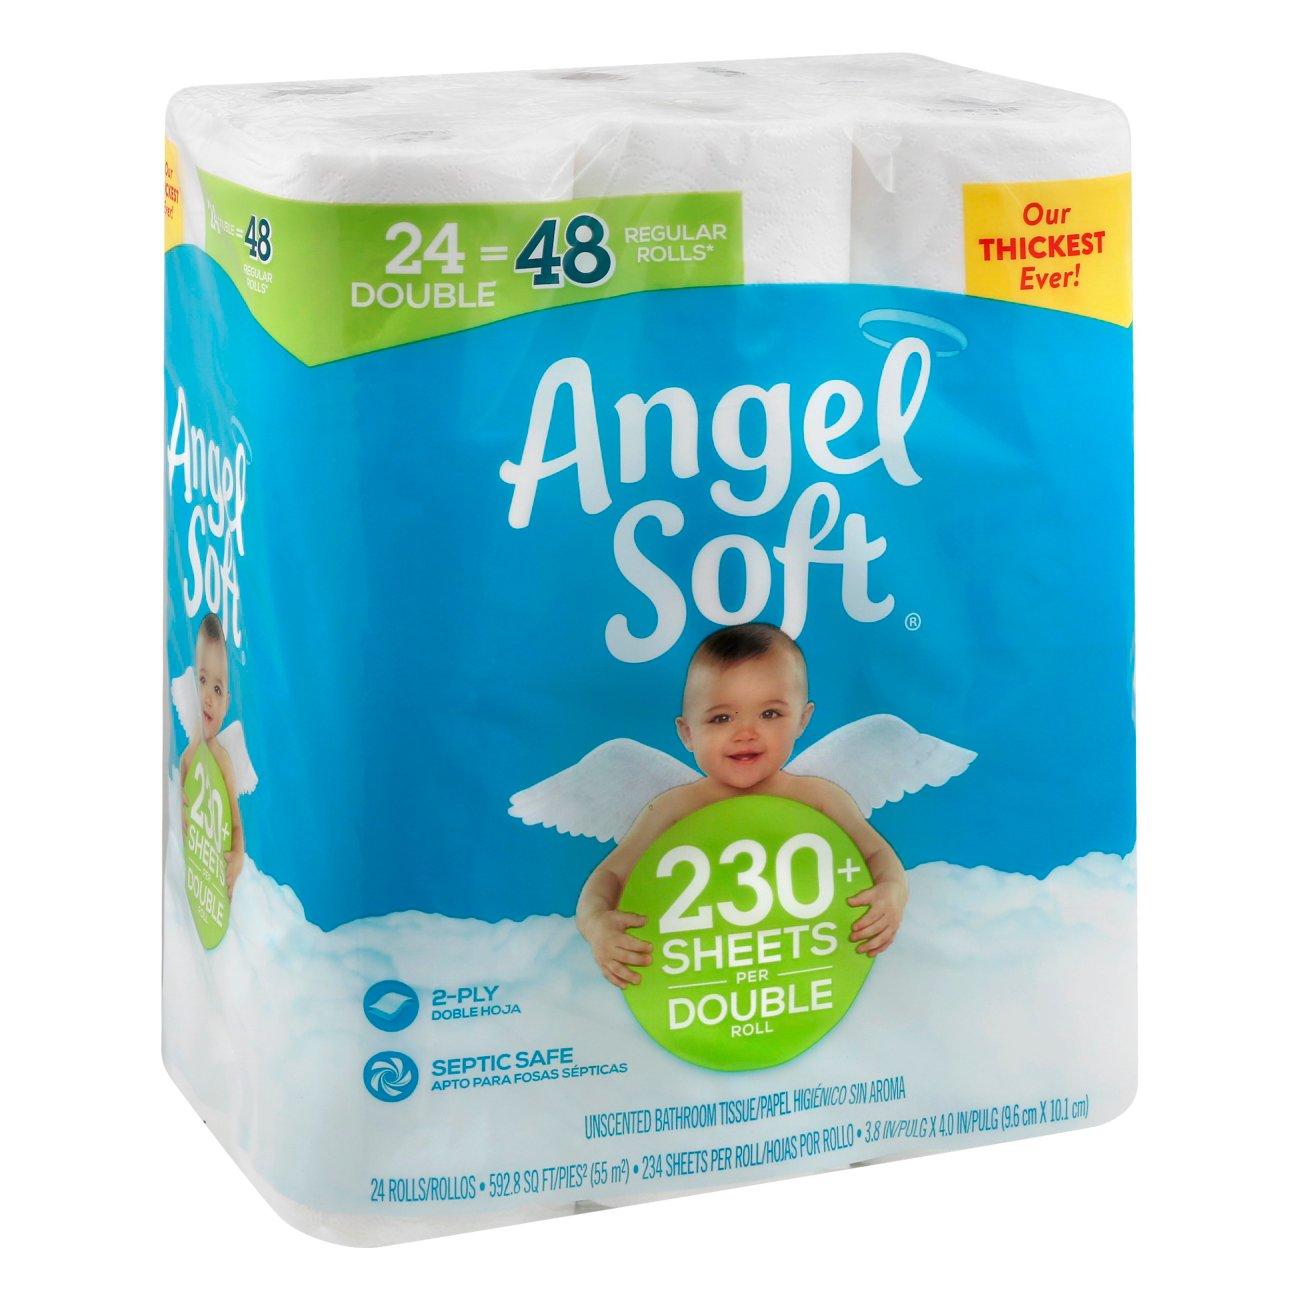 White Cloud Bathroom Tissue - Angel soft classic white bath tissue double rolls